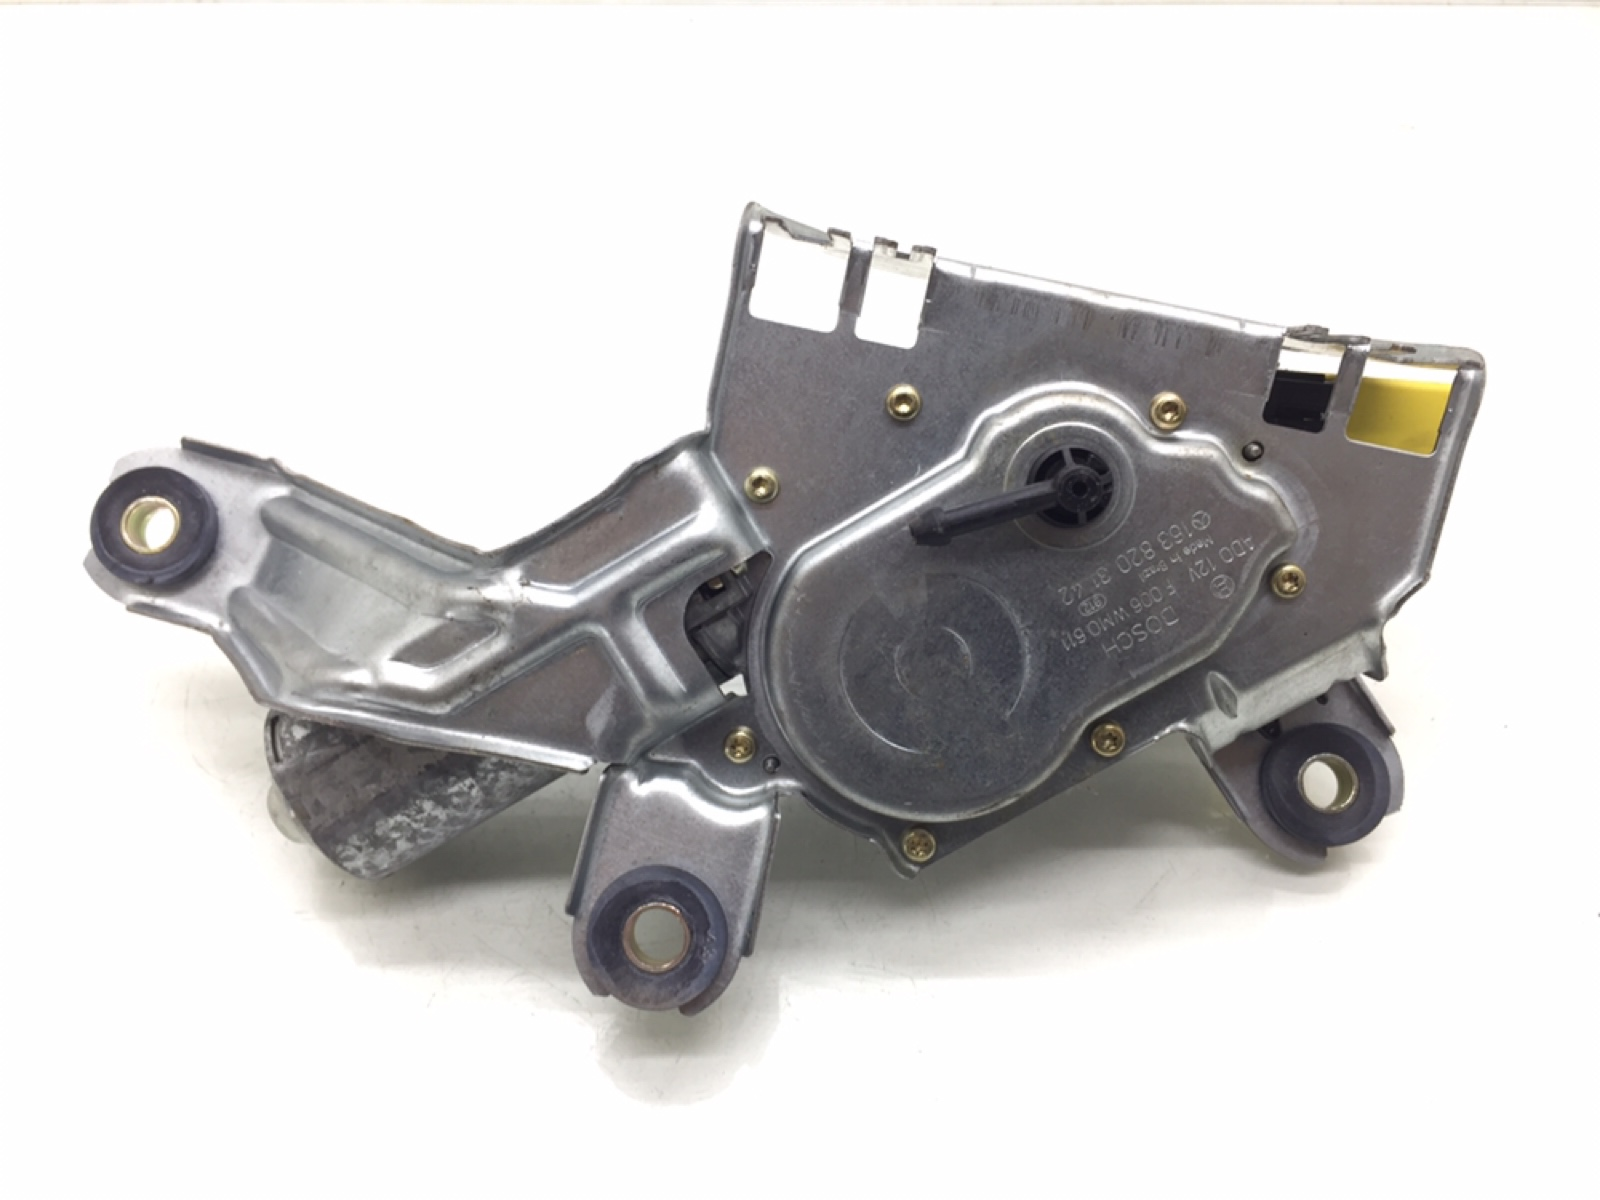 Моторчик заднего стеклоочистителя (дворника) Mercedes Ml W163 3.2 I 2001 (б/у)